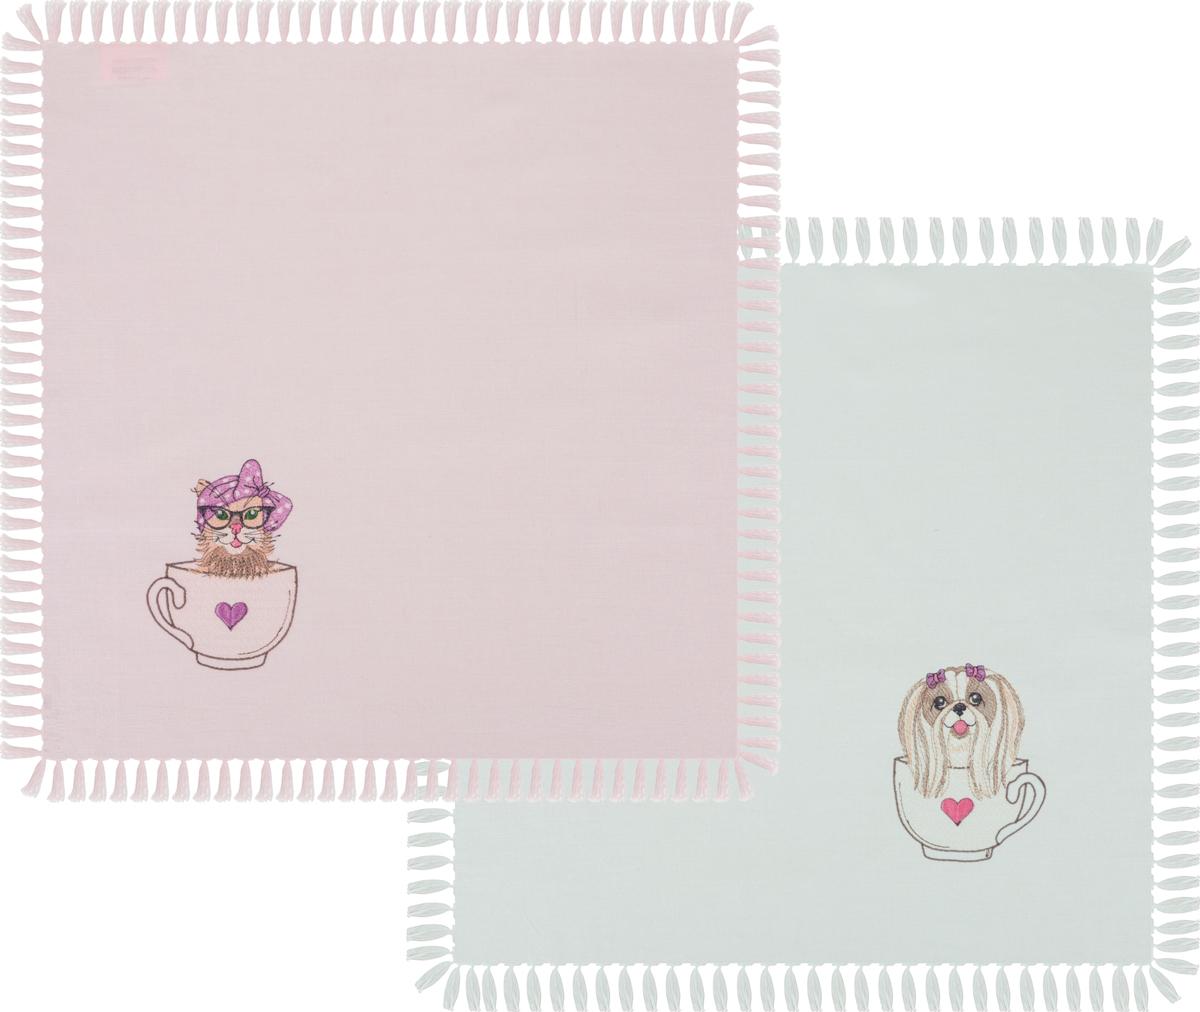 Набор салфеток 850-844-81 из 2-х шт милашки в чашках 40х40 см, св.зел+розовый